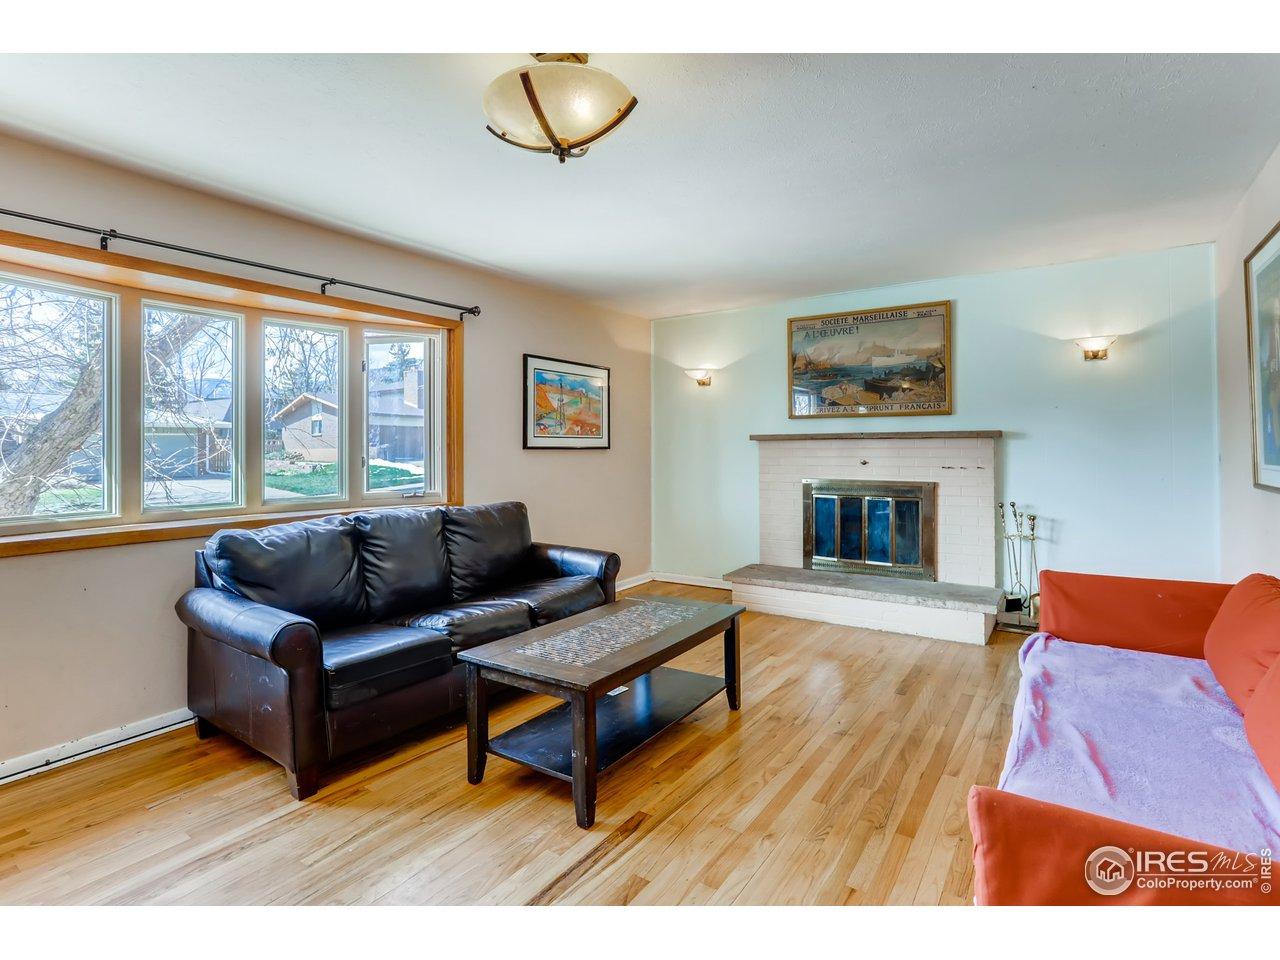 Double pane windows & hardwood floors.